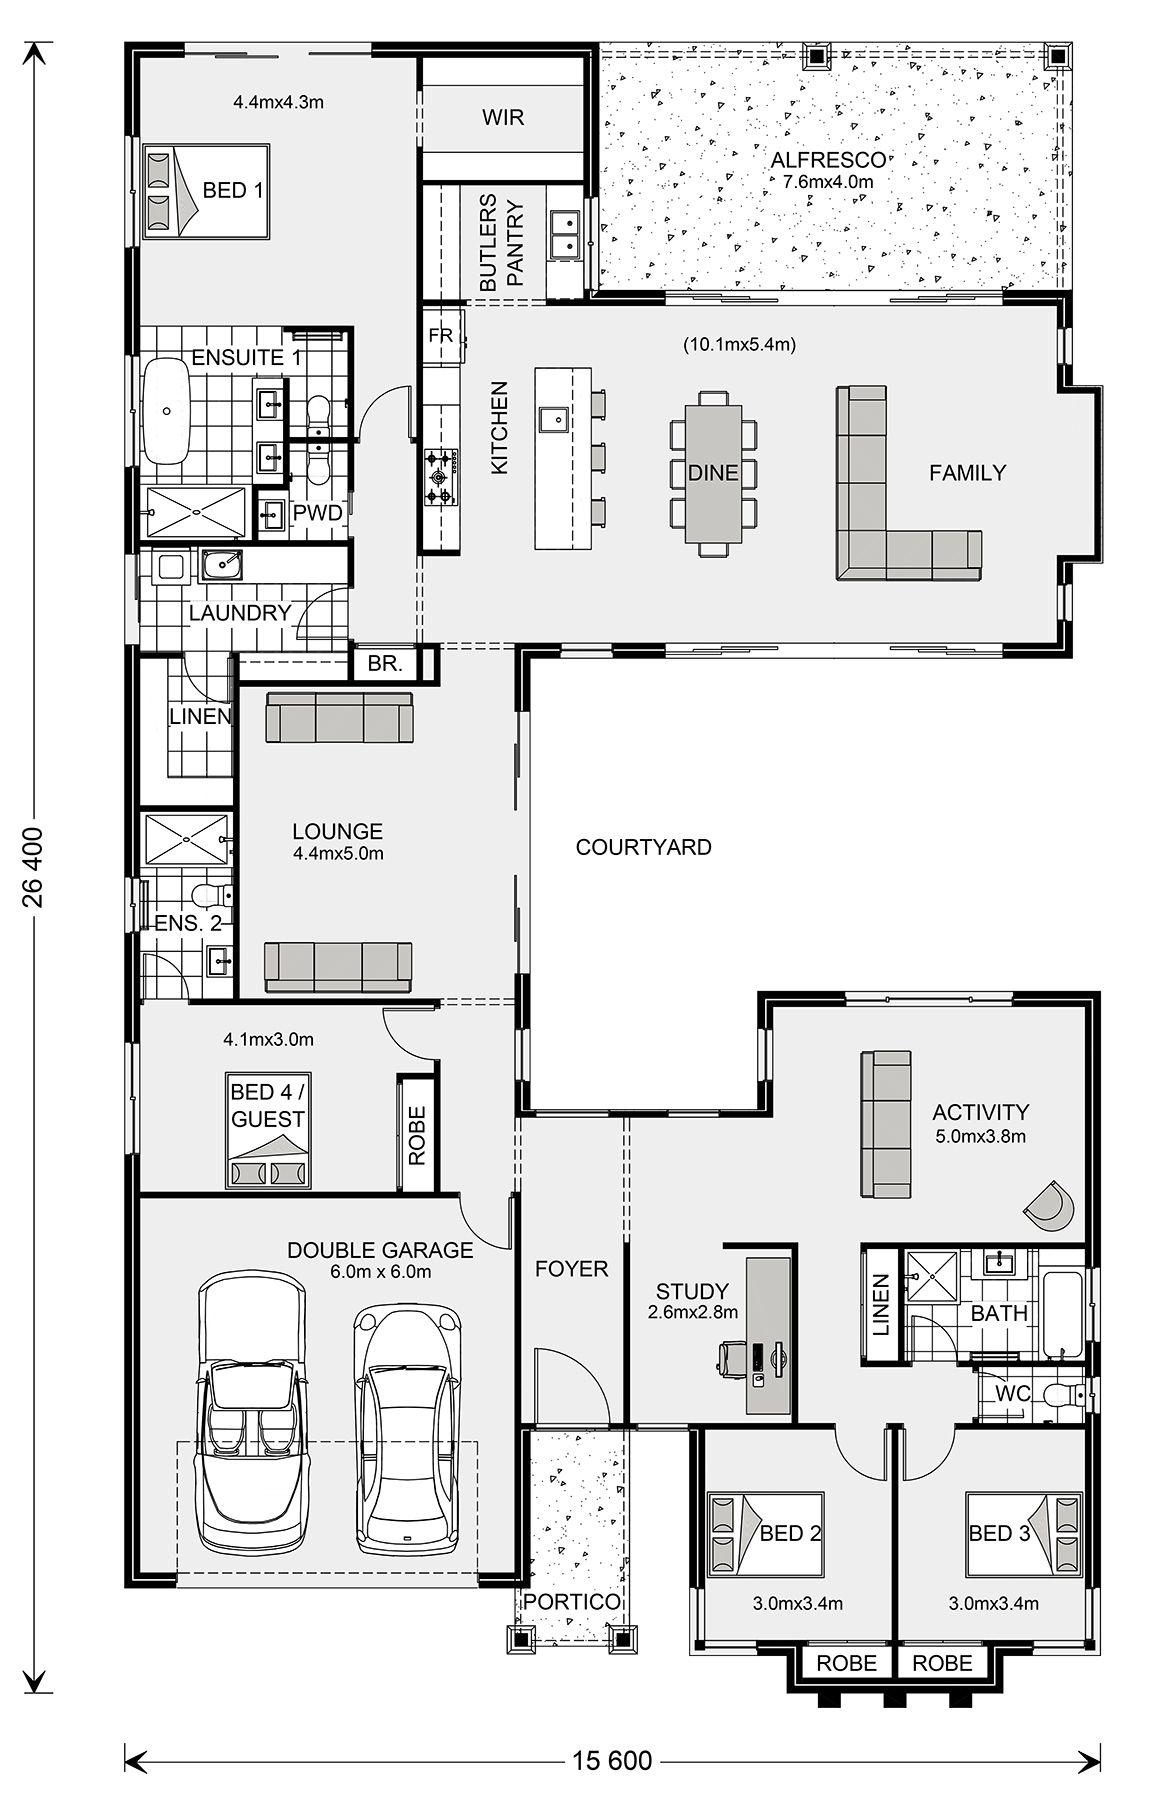 Mandalay 300, Design Ideas, Home Designs in | G.J. Gardner ...